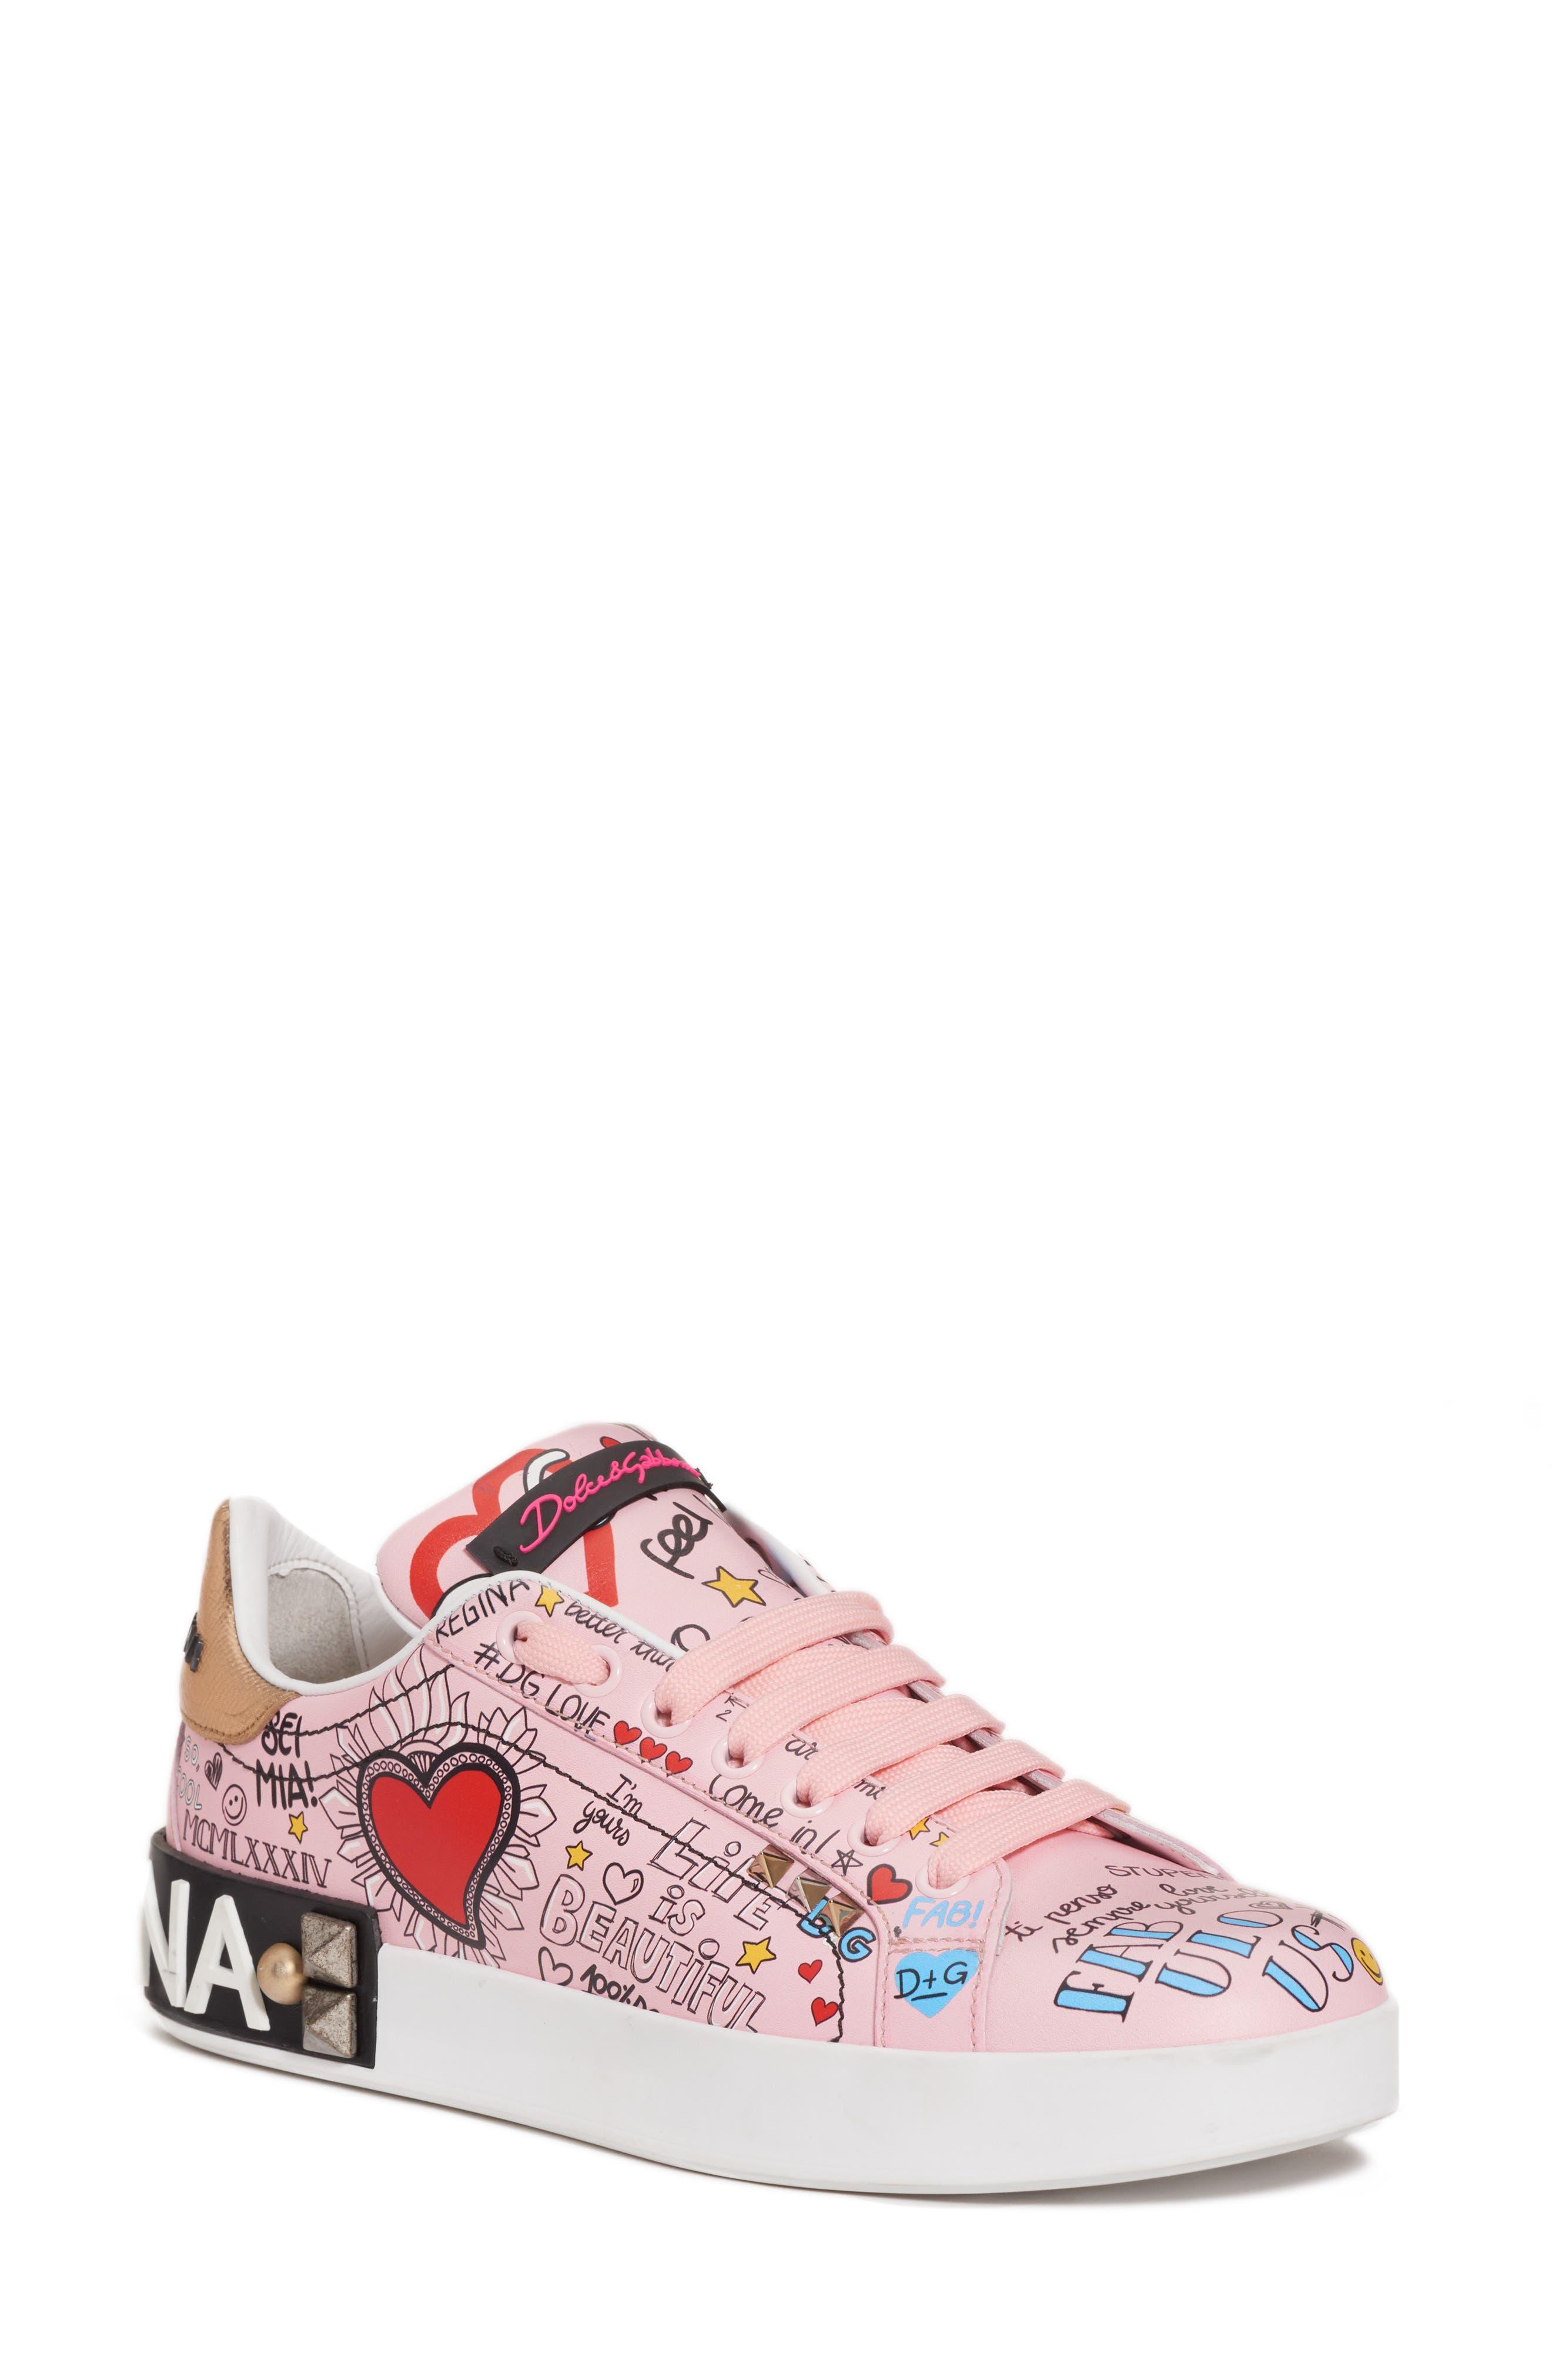 DOLCE&GABBANA,                             Mural Graffiti Sneaker,                             Main thumbnail 1, color,                             690